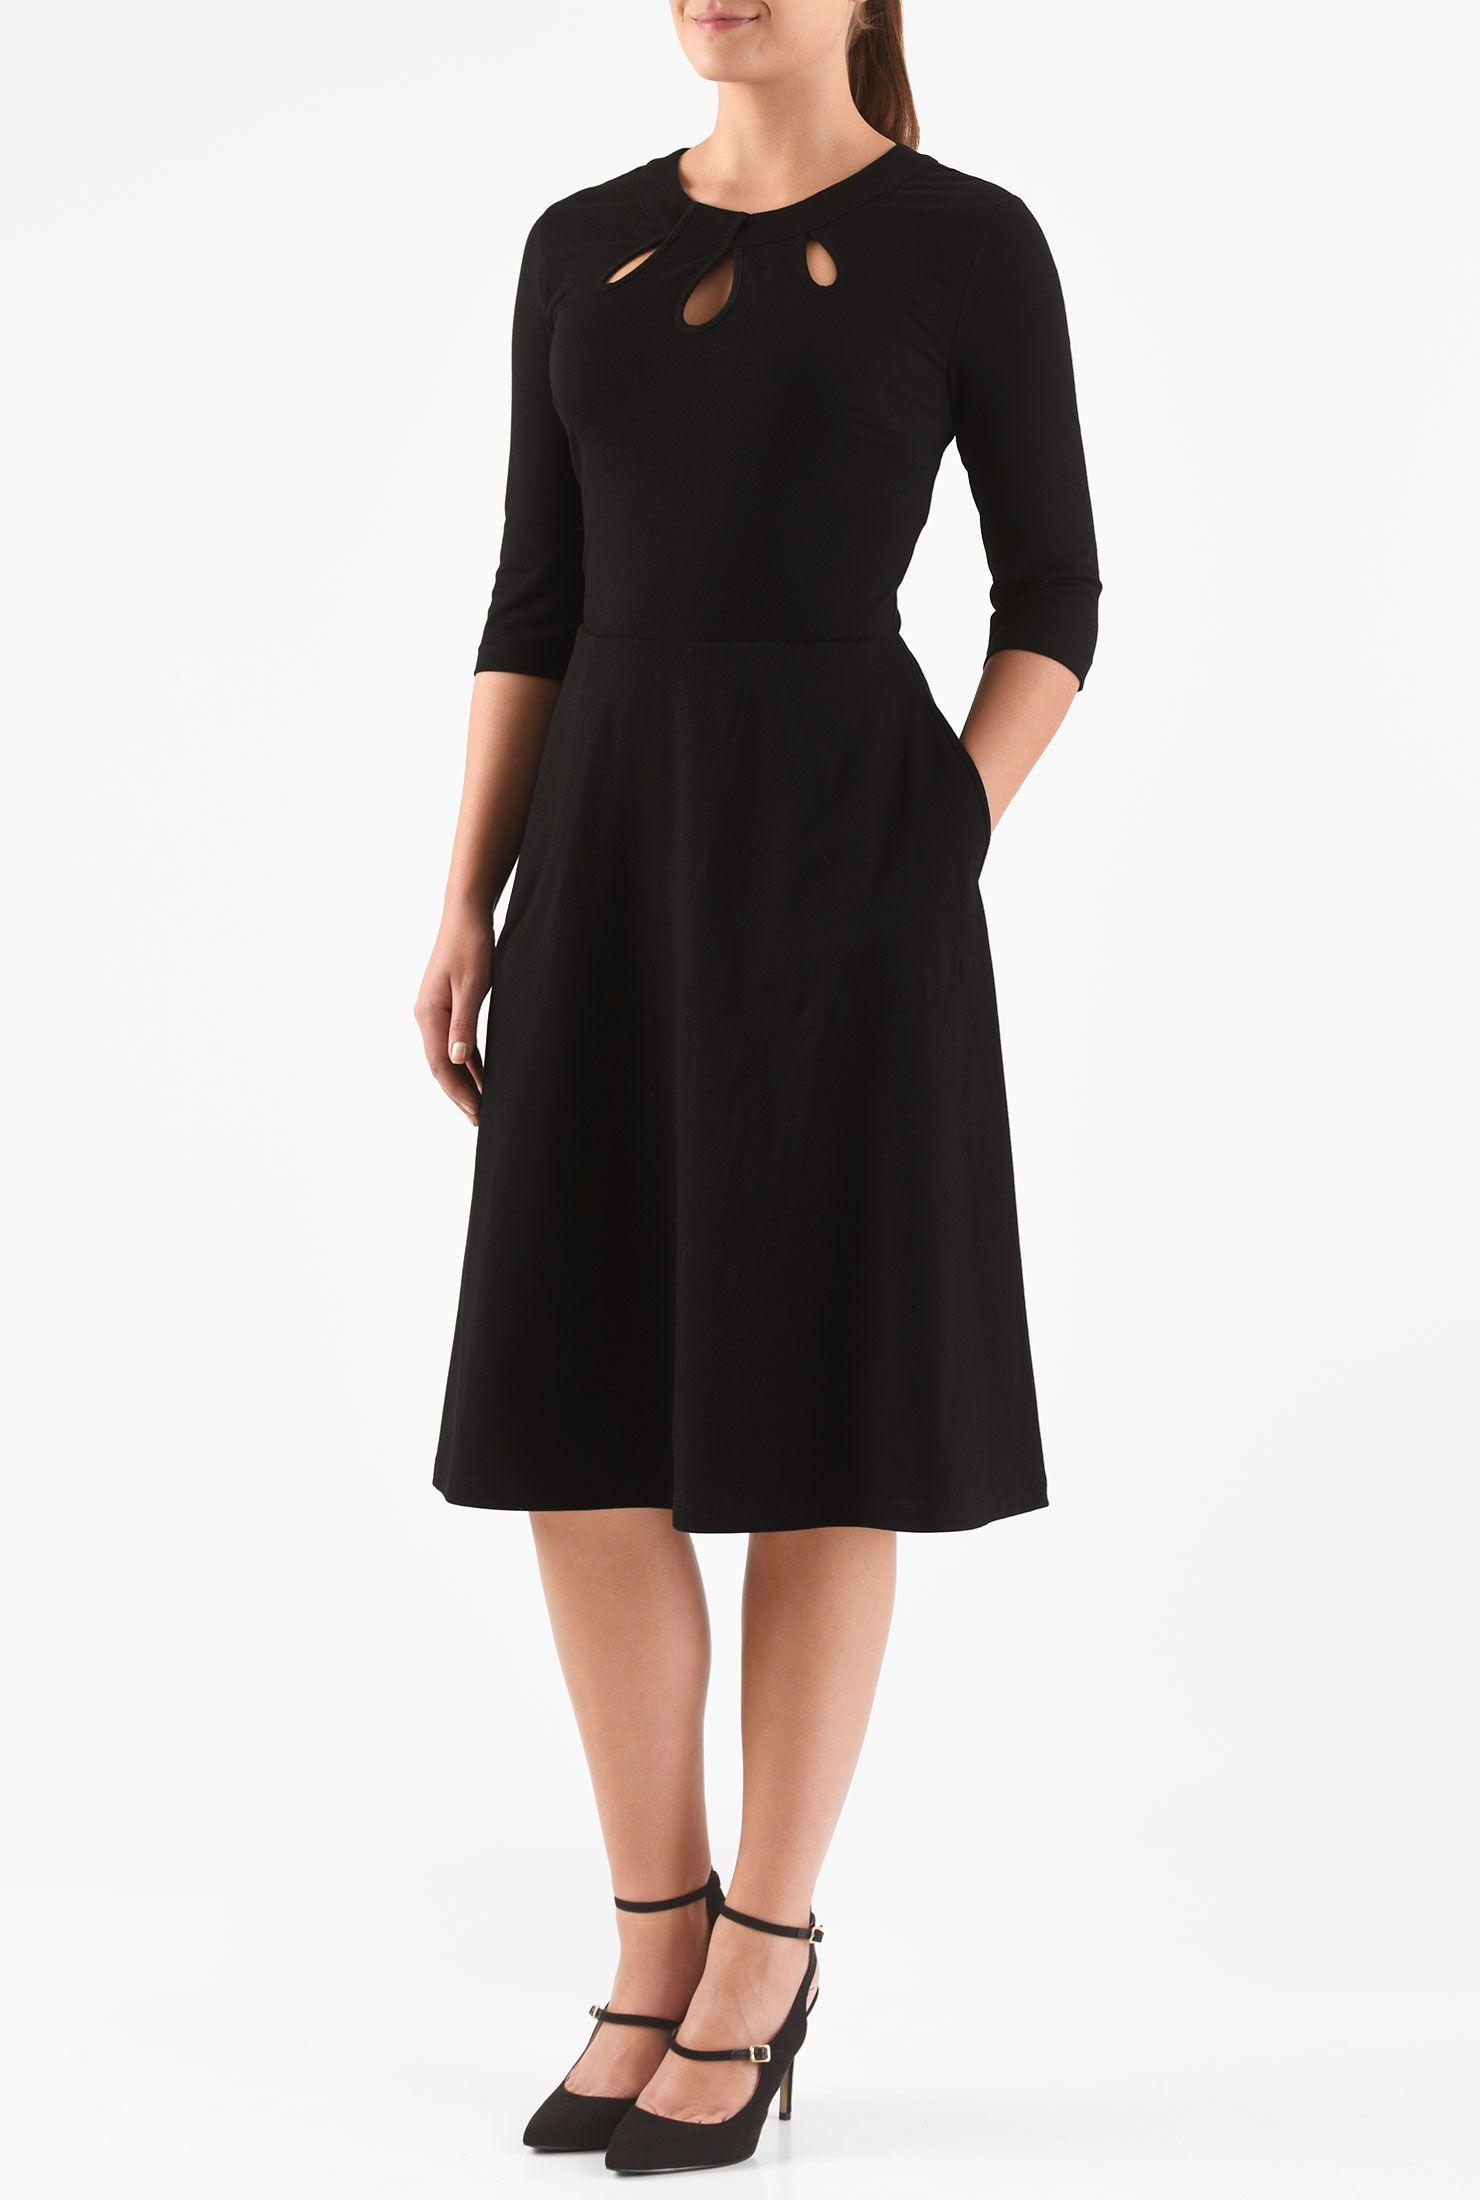 Below Knee Length Dresses